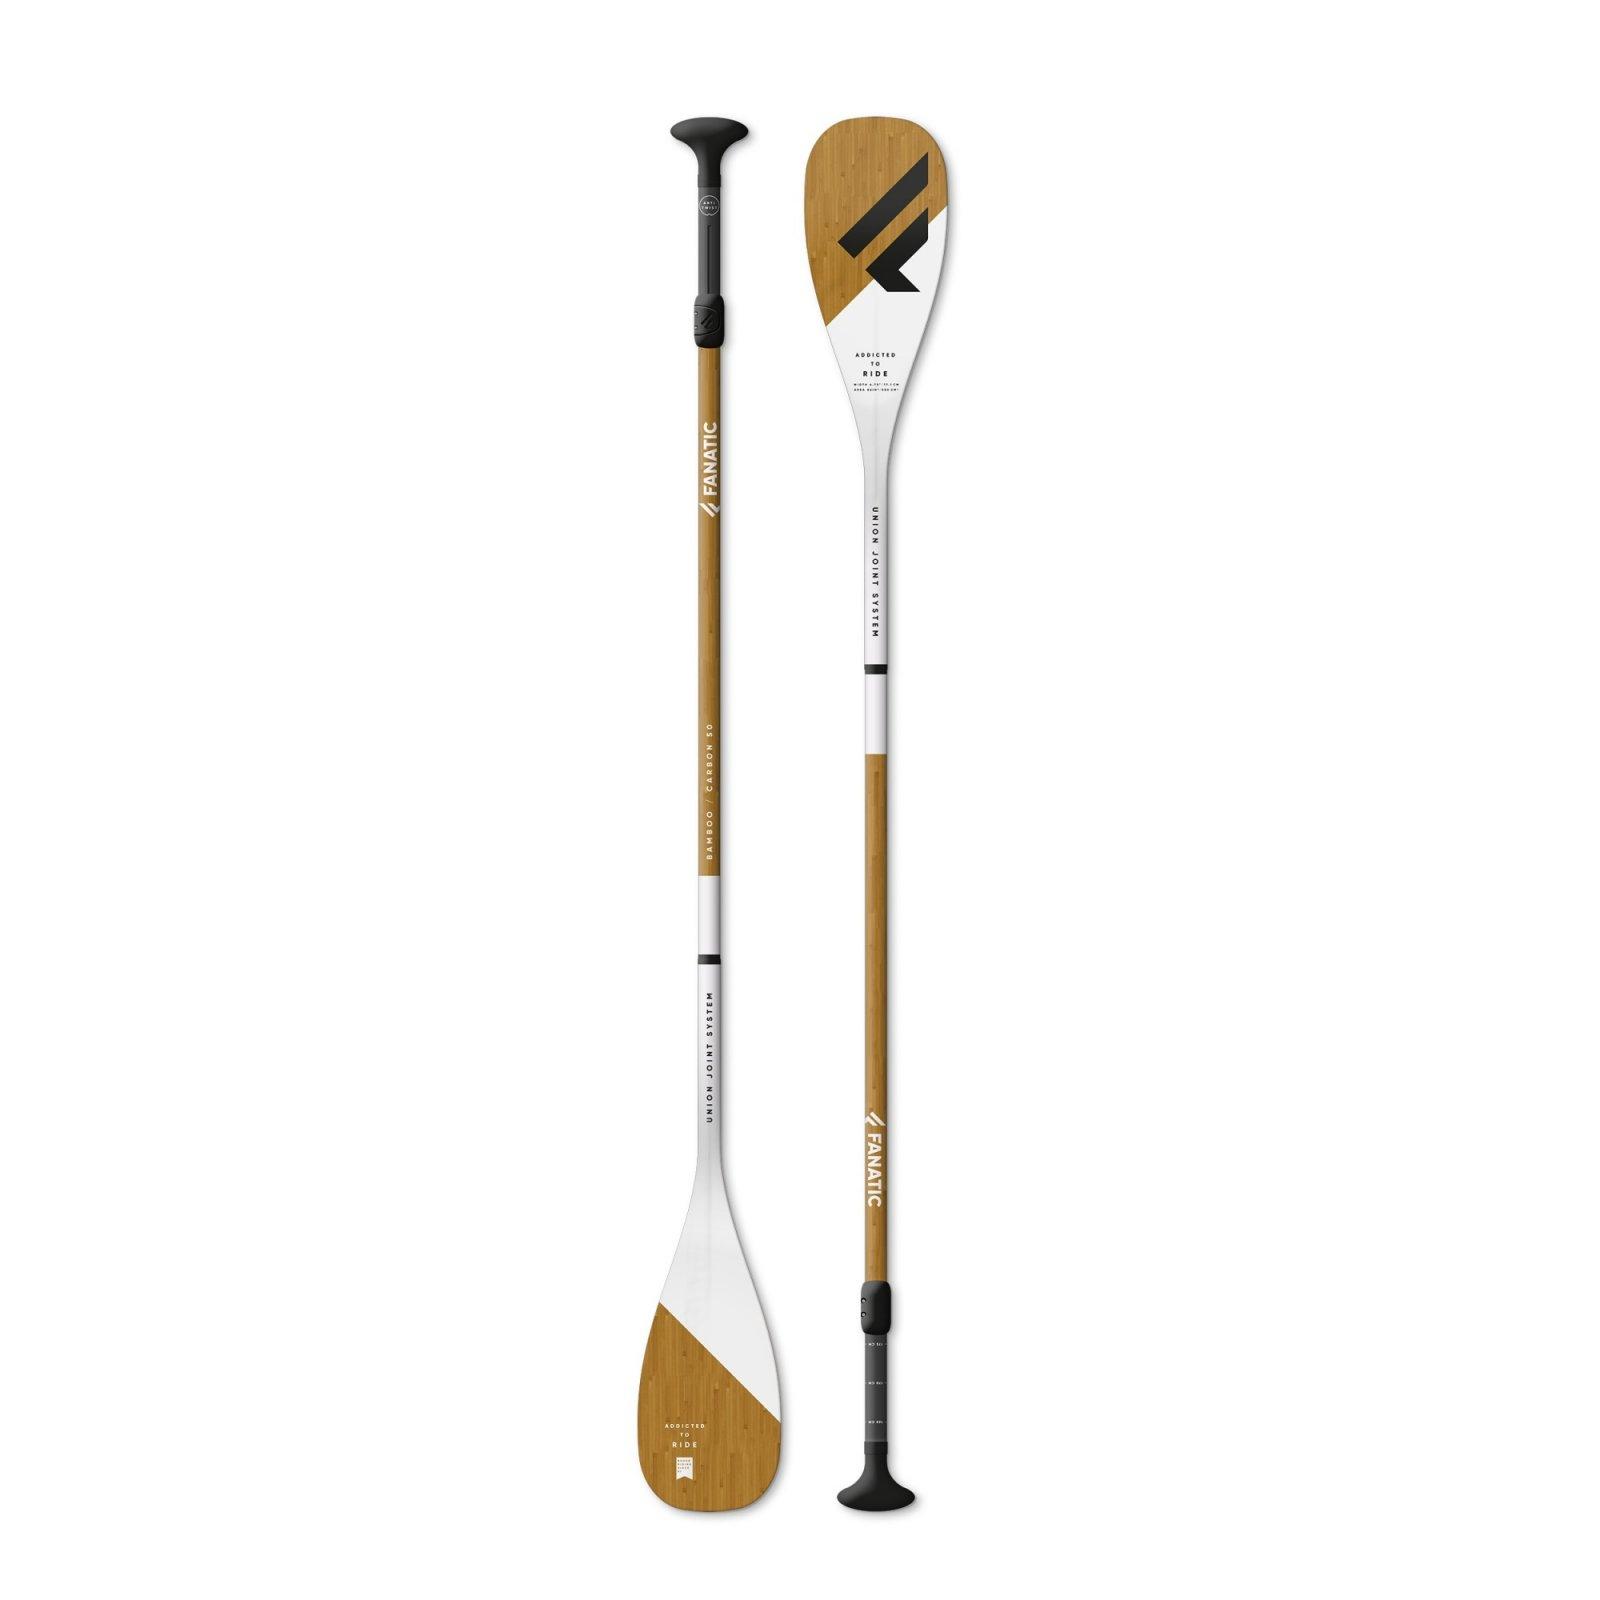 Fanatic Bamboo Carbon 50 Adj. SUP Paddle